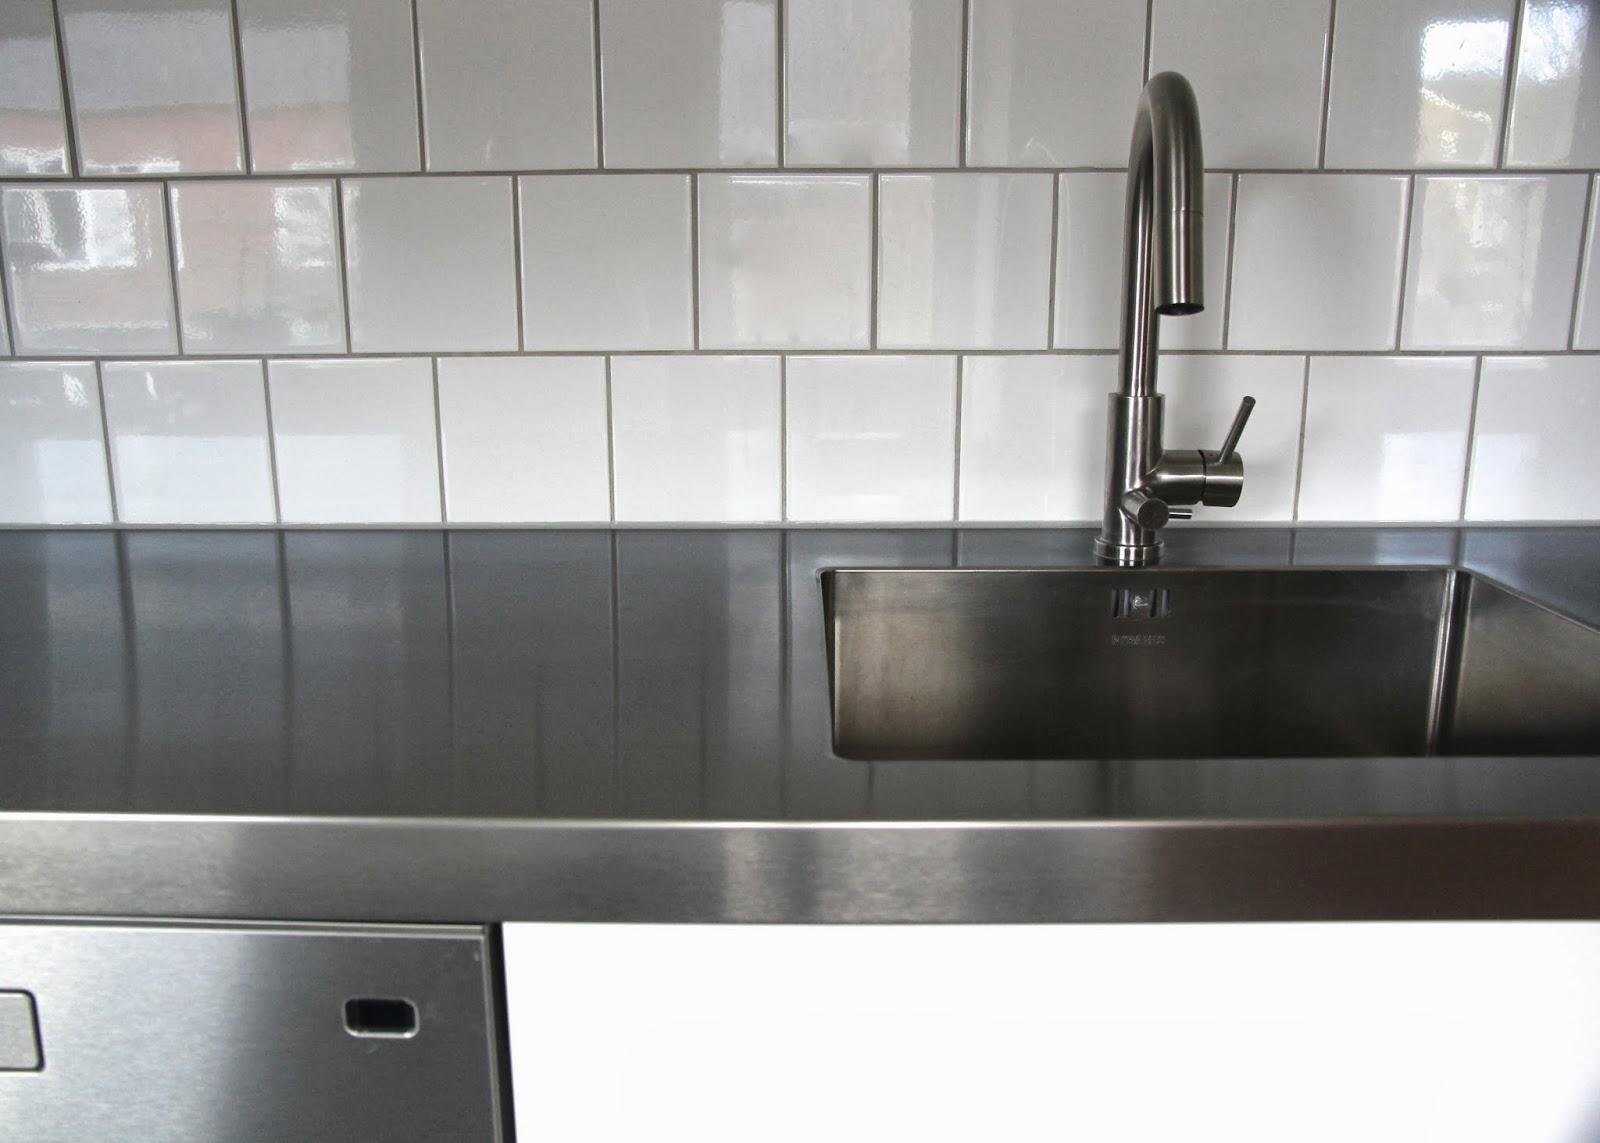 ikea k?k diskho  neonela Rostfri Design IKEA Metod med 635 mm djup